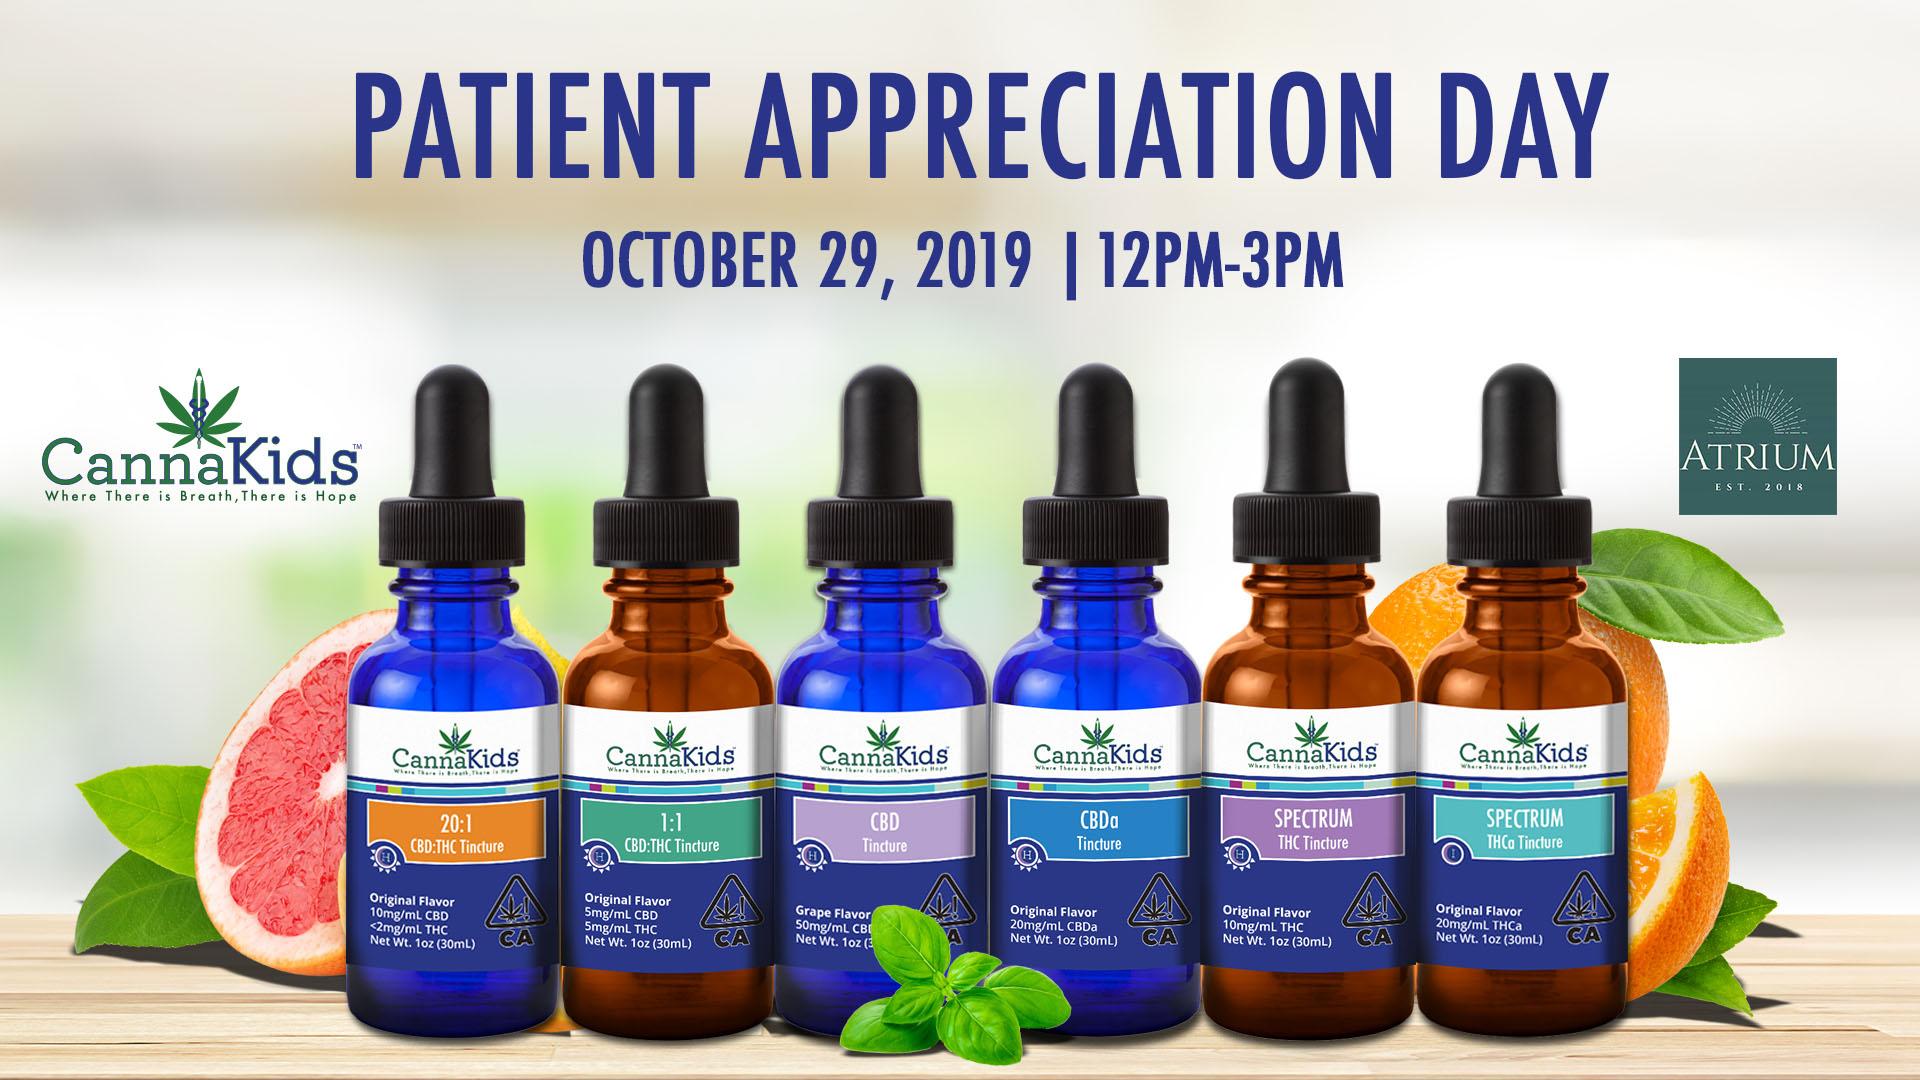 CannaKids Patient Appreciation Day at Atrium Topanga